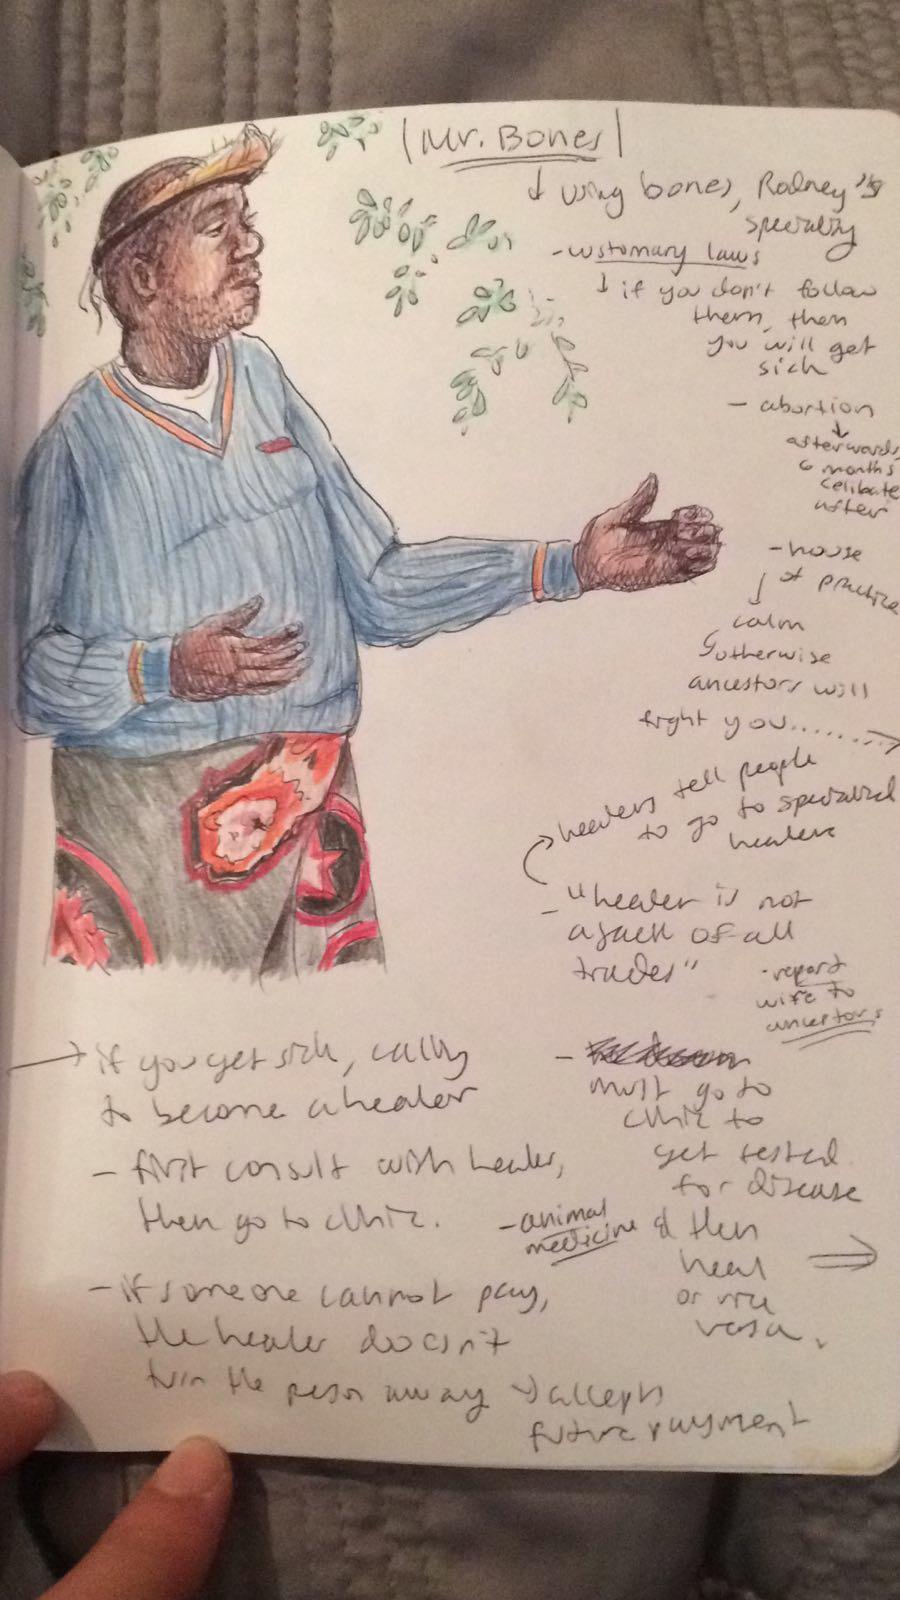 South Africa - artwork -Ysemay Dercon traditional healer sketchbook S. Africa.JPG